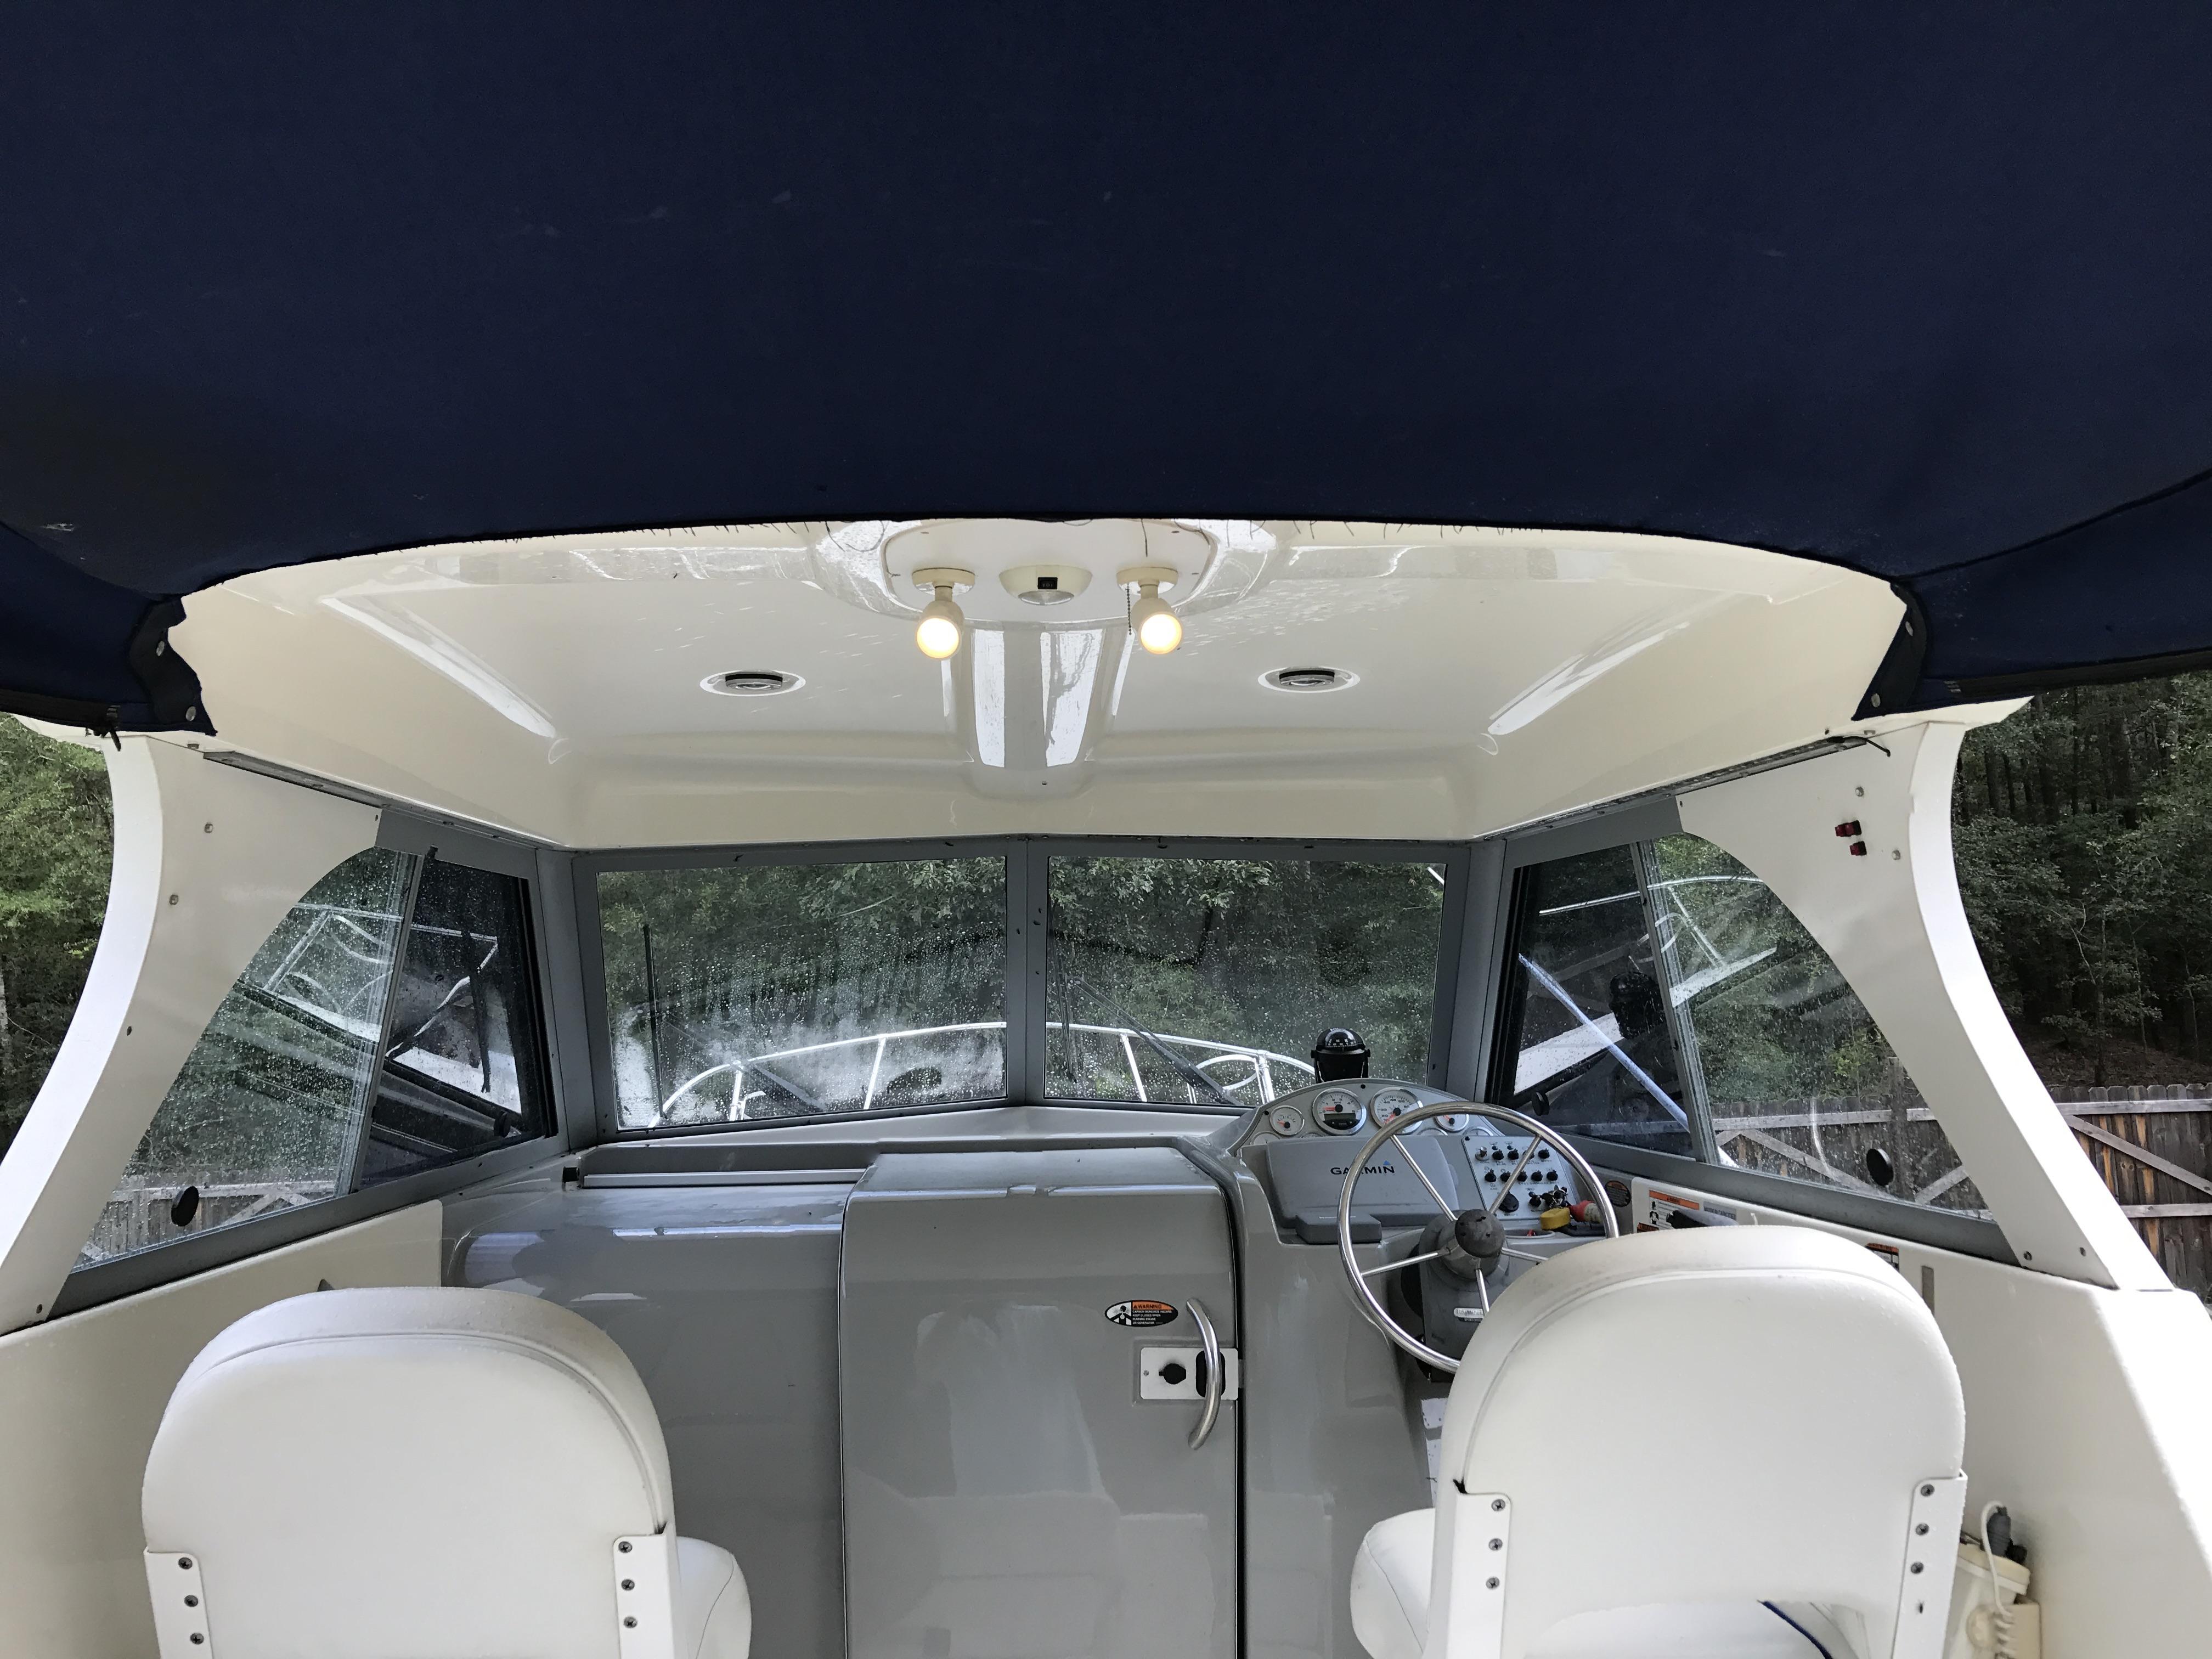 Bayliner Discovery 246 EC - hardtop enclosed bridge